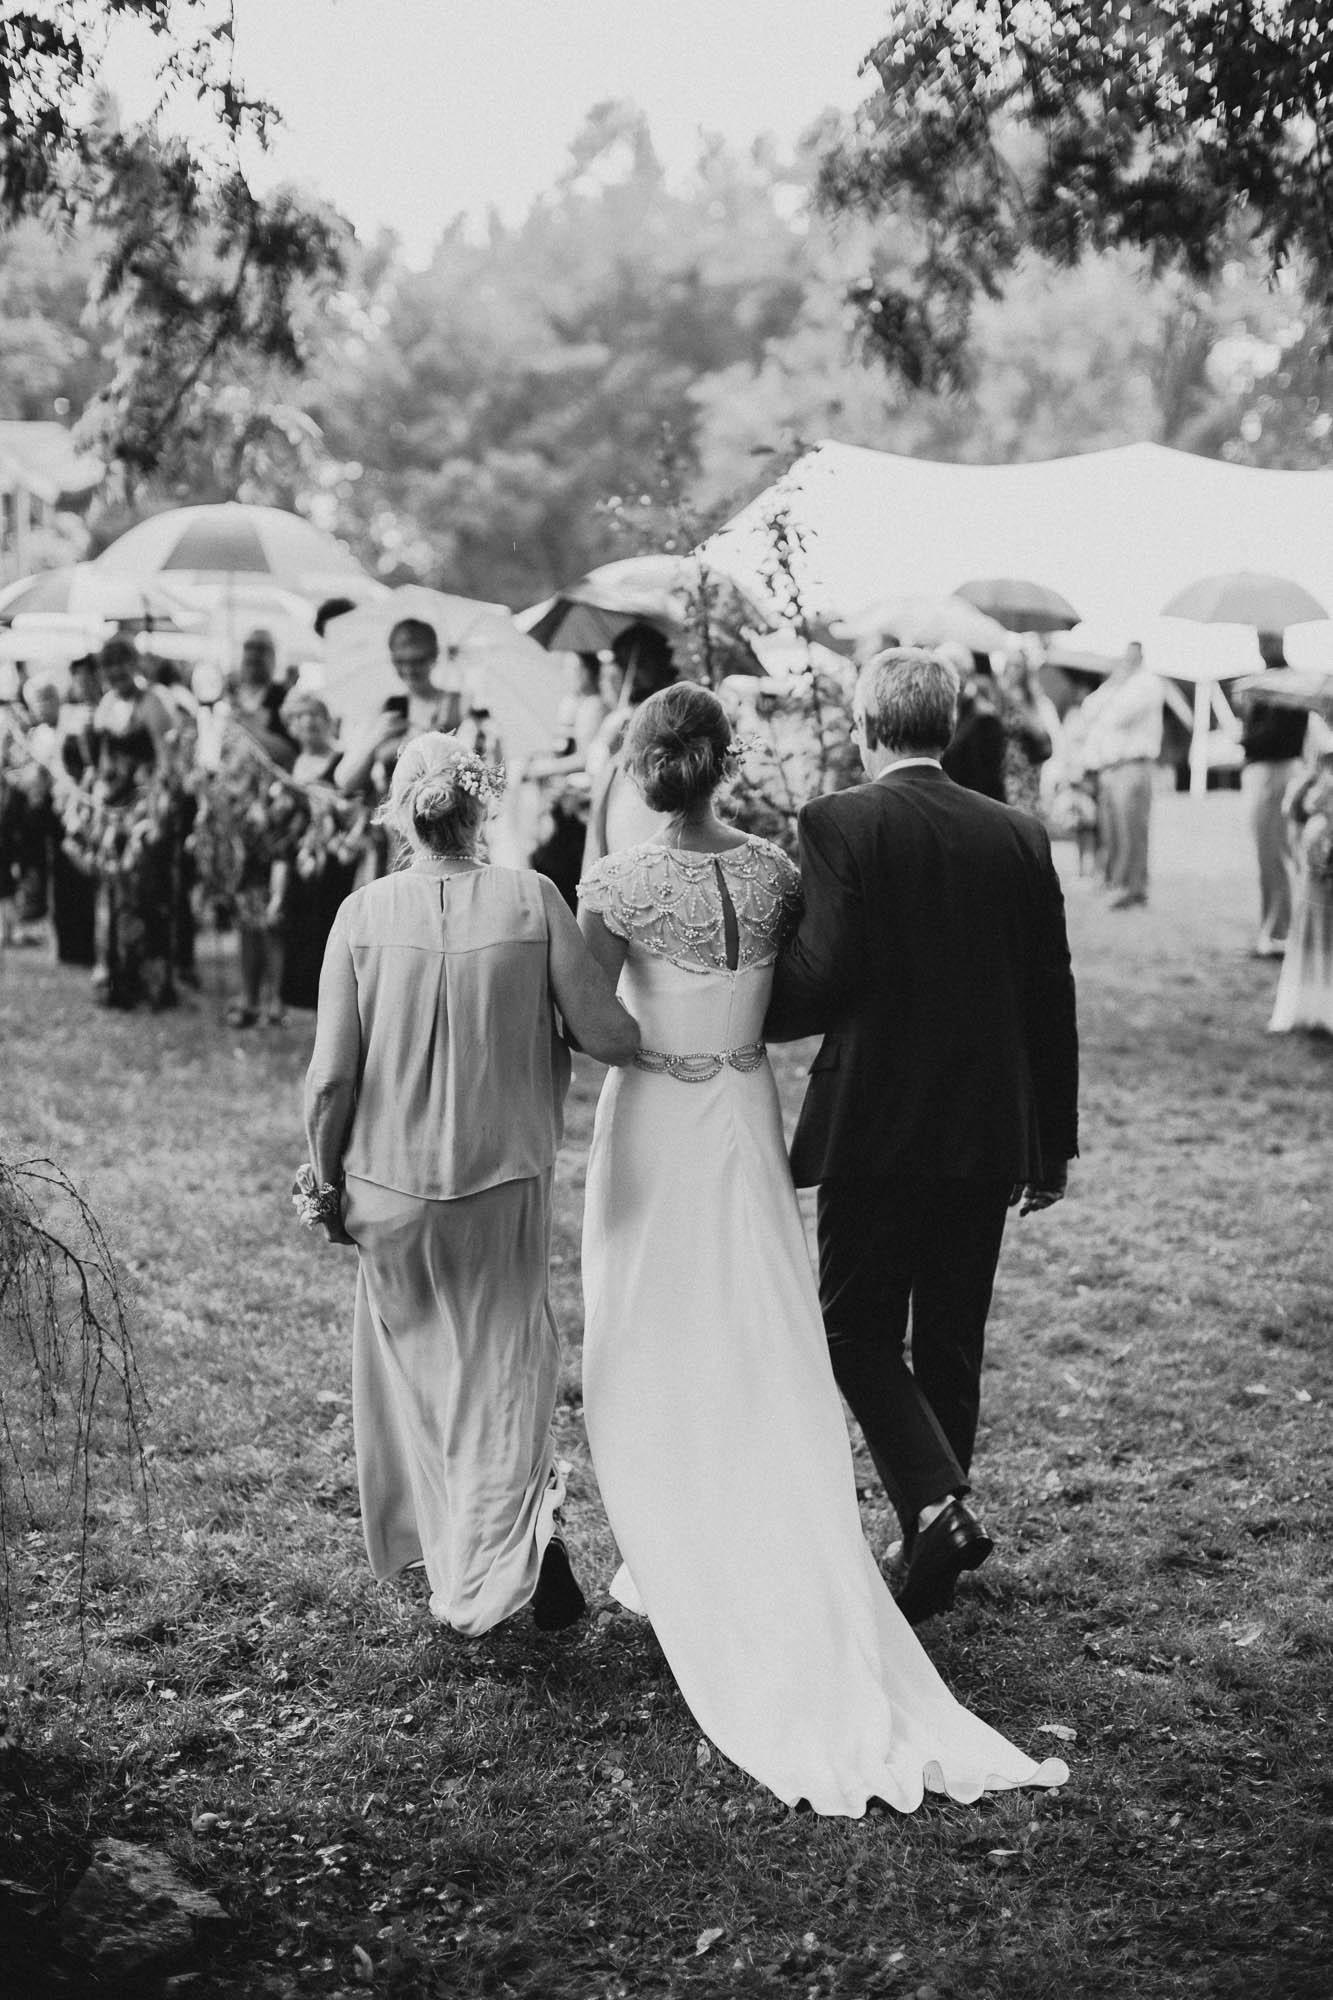 Leah-Graham-Michigan-Outdoor-DIY-Wedding-046@2x.jpg